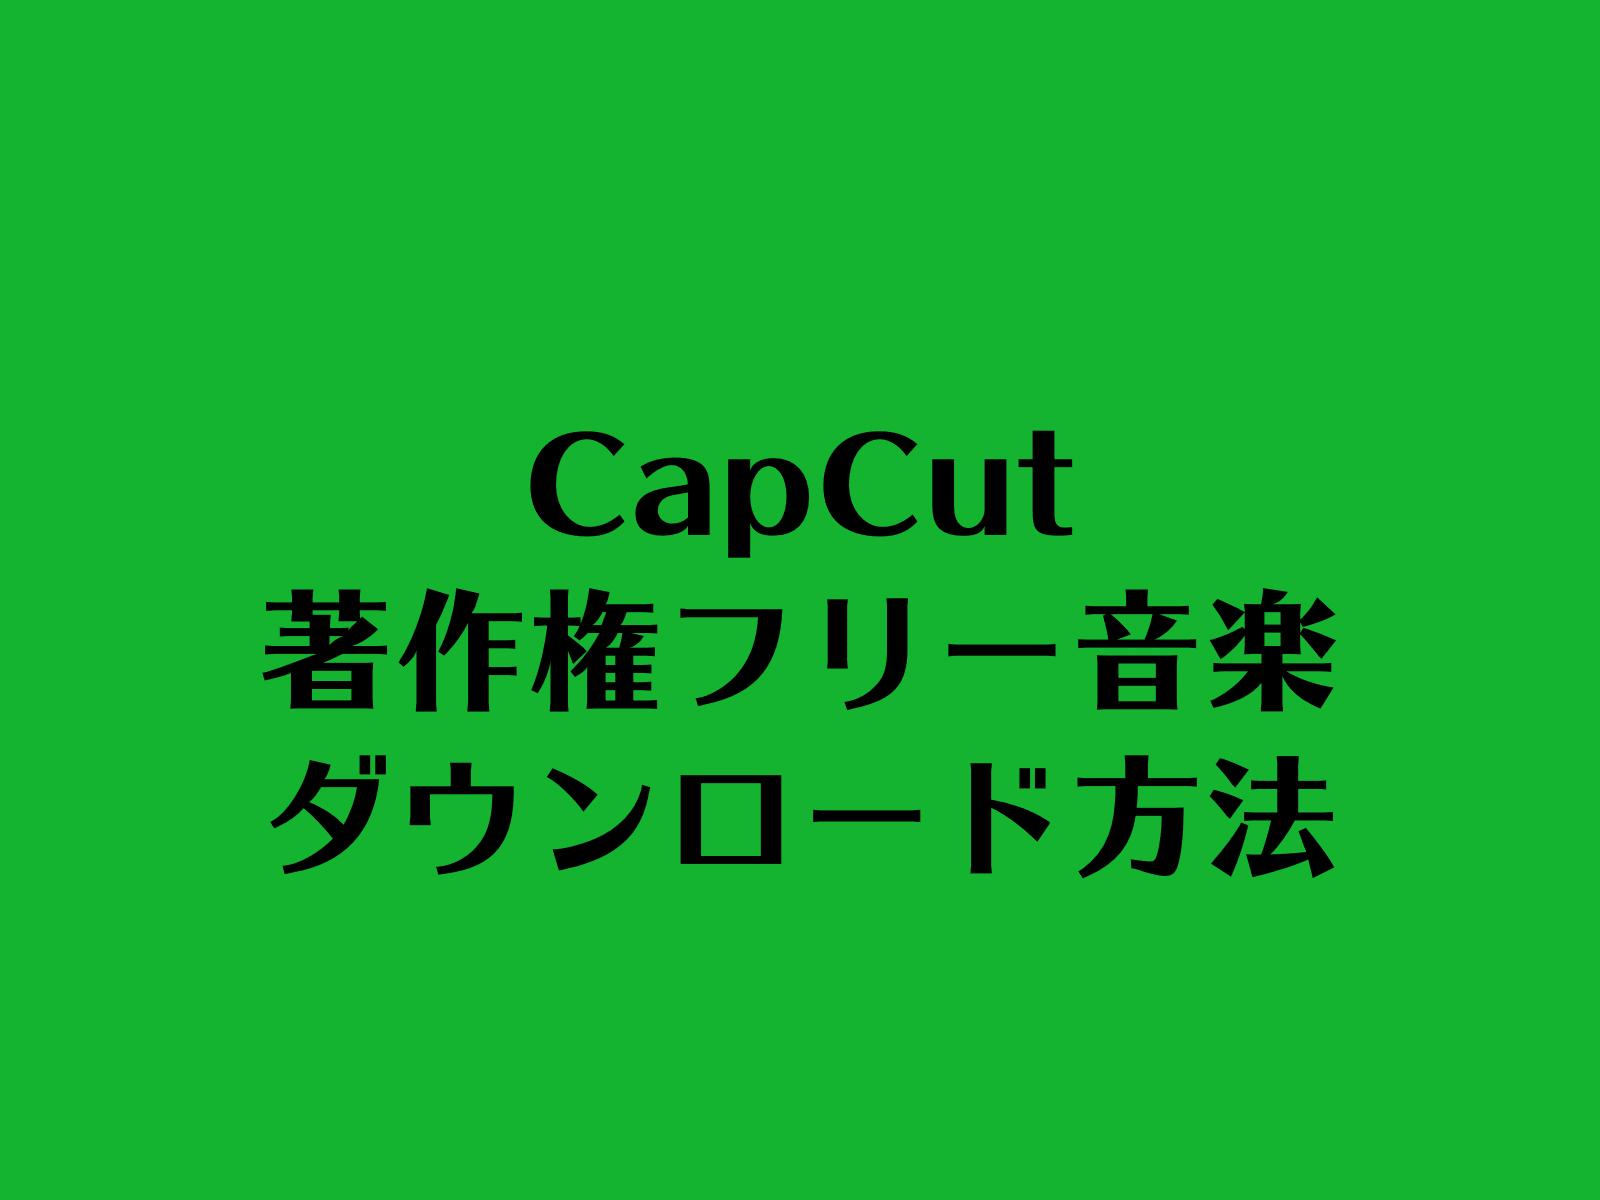 CapCut著作権フリー音楽ダウンロード